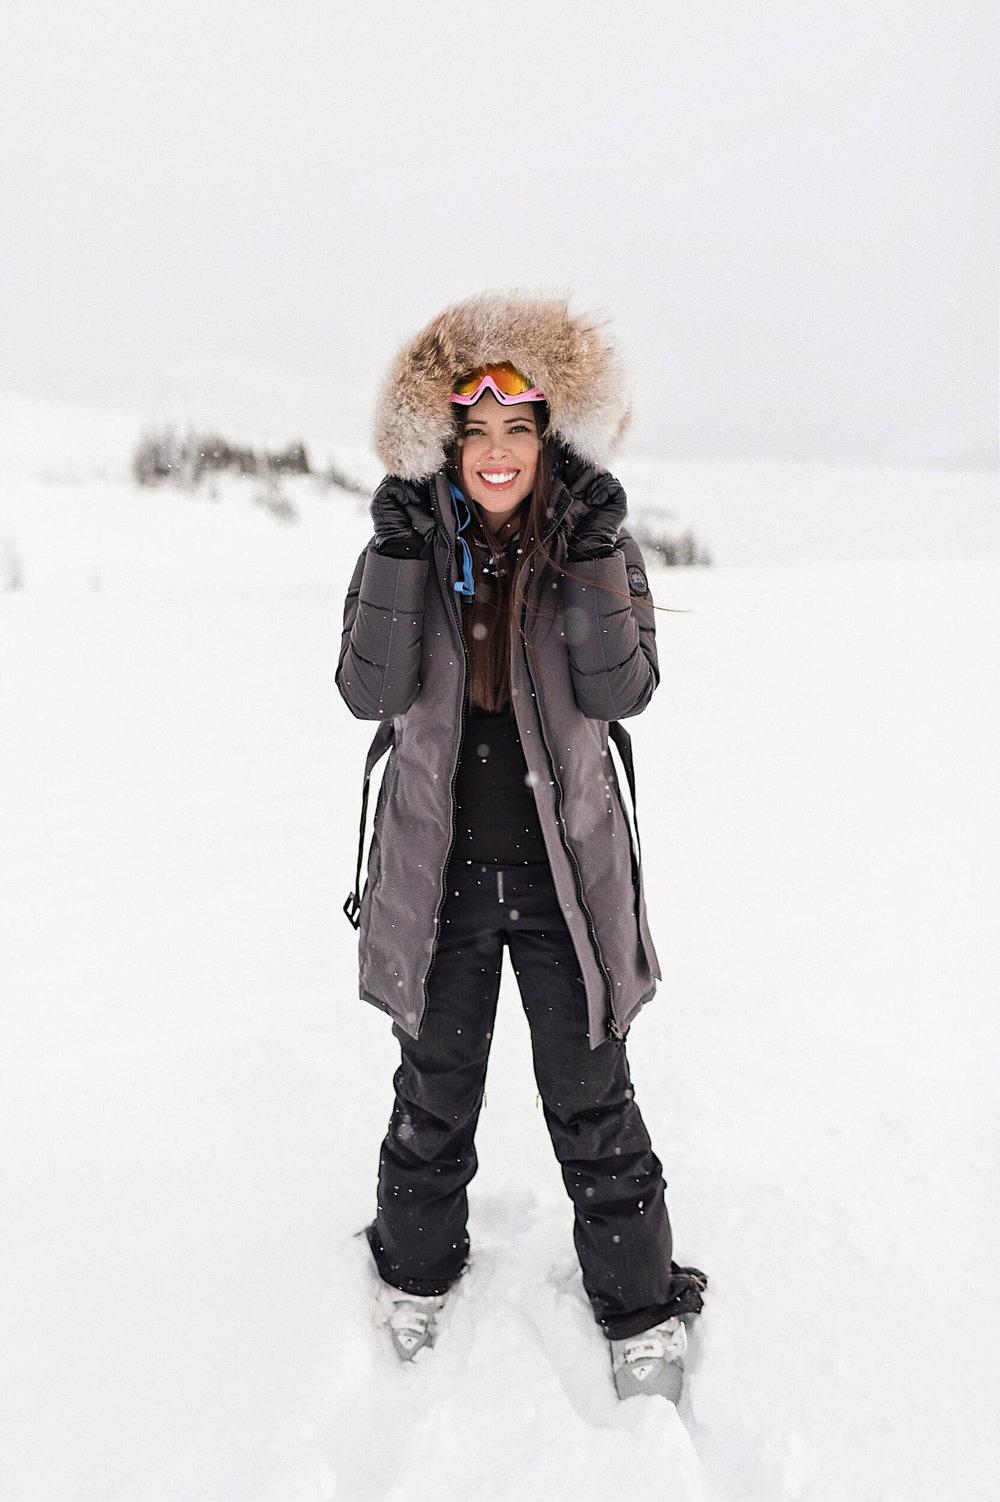 ckanani-banff-winter-a-guide-to-visiting-78.jpg